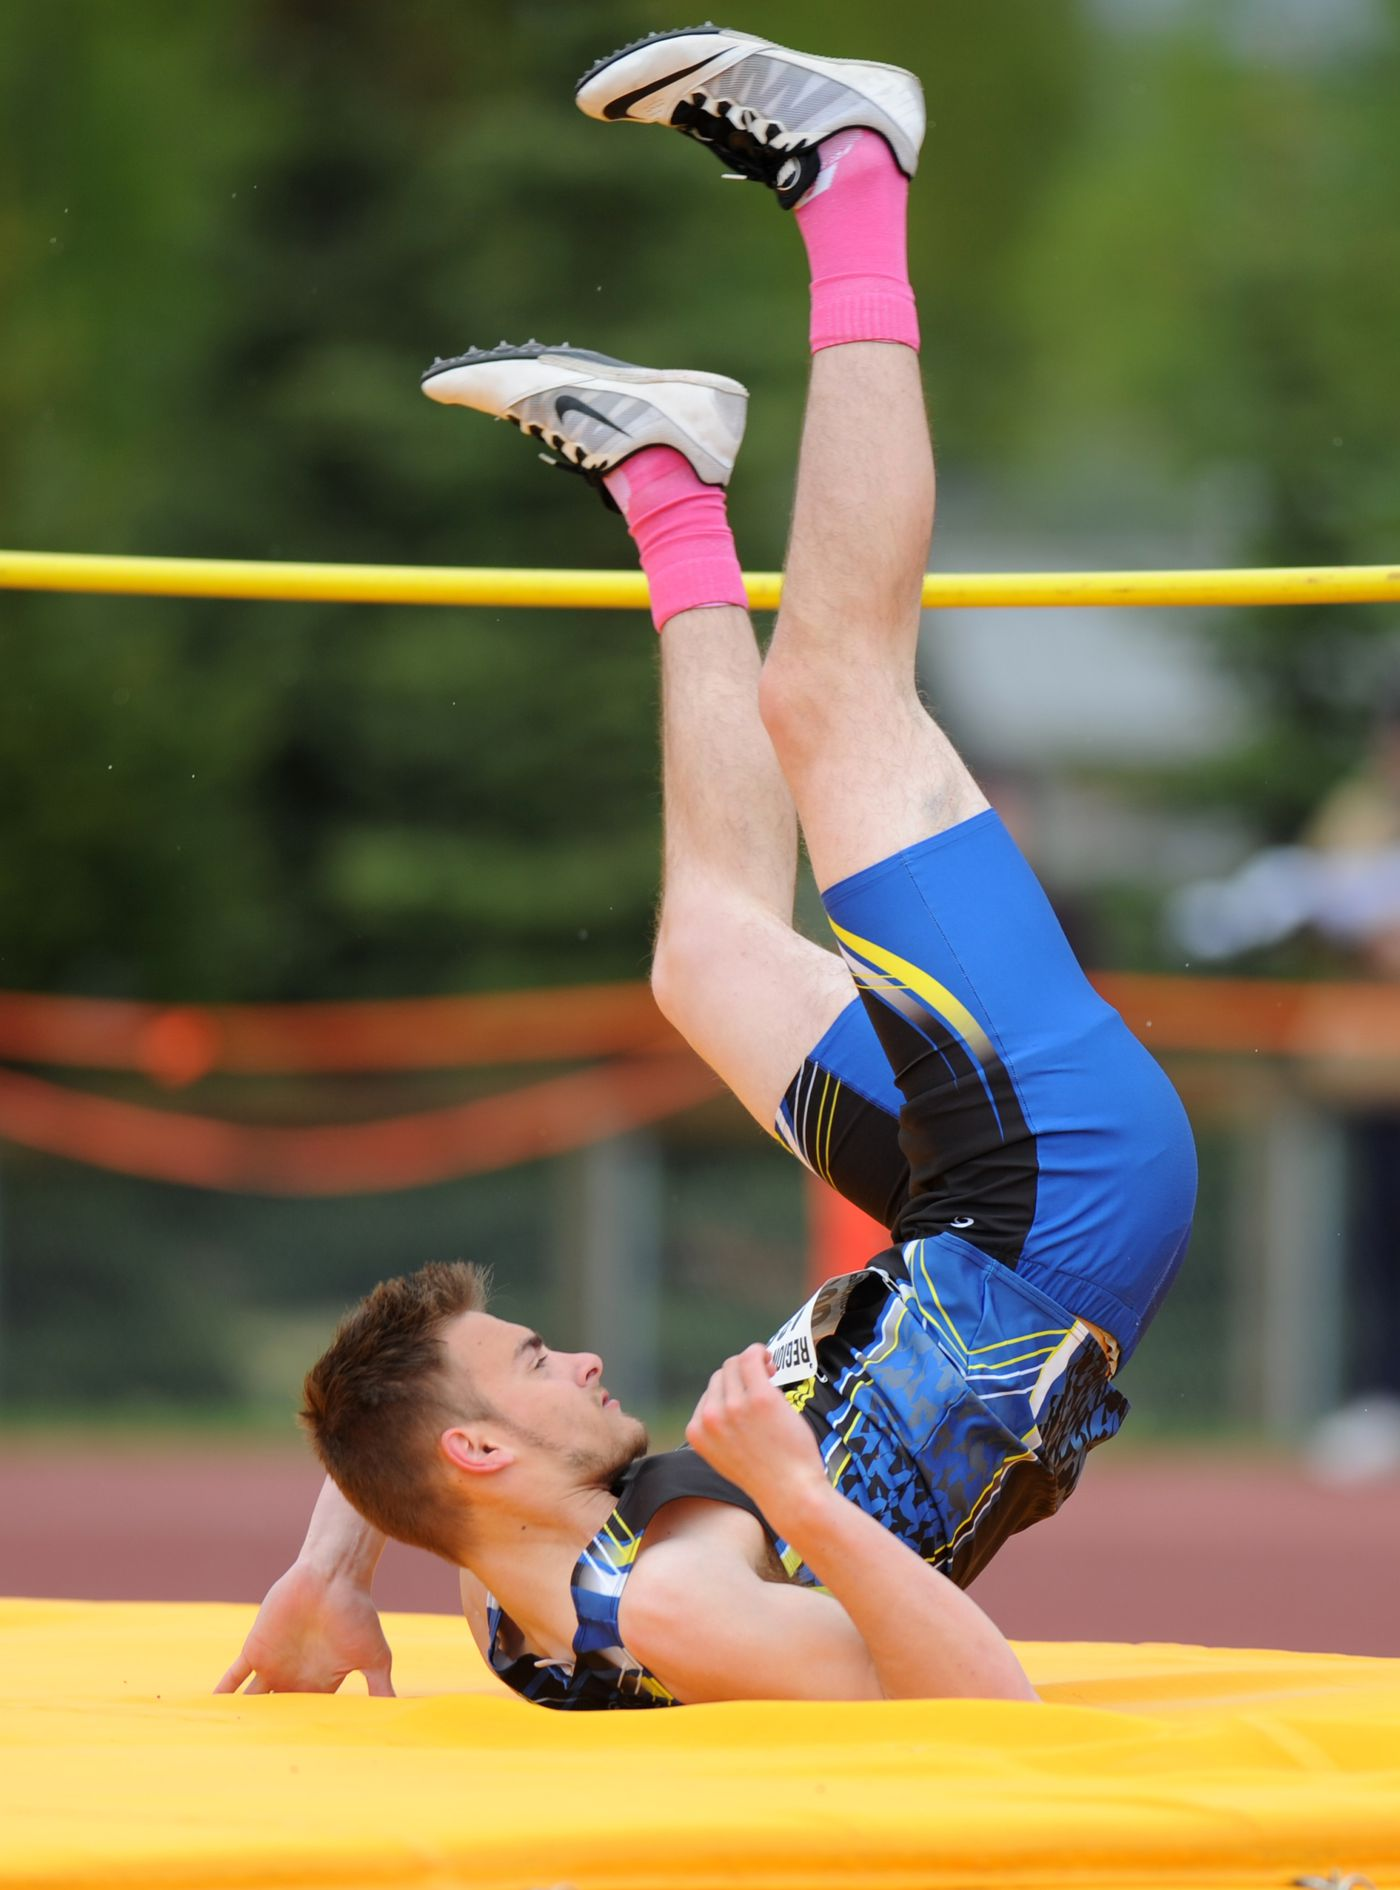 Dallas Tellef of Bartlett clears thebar en route to a third-place finish in the high jump. (Erik Hill / Alaska Dispatch News)